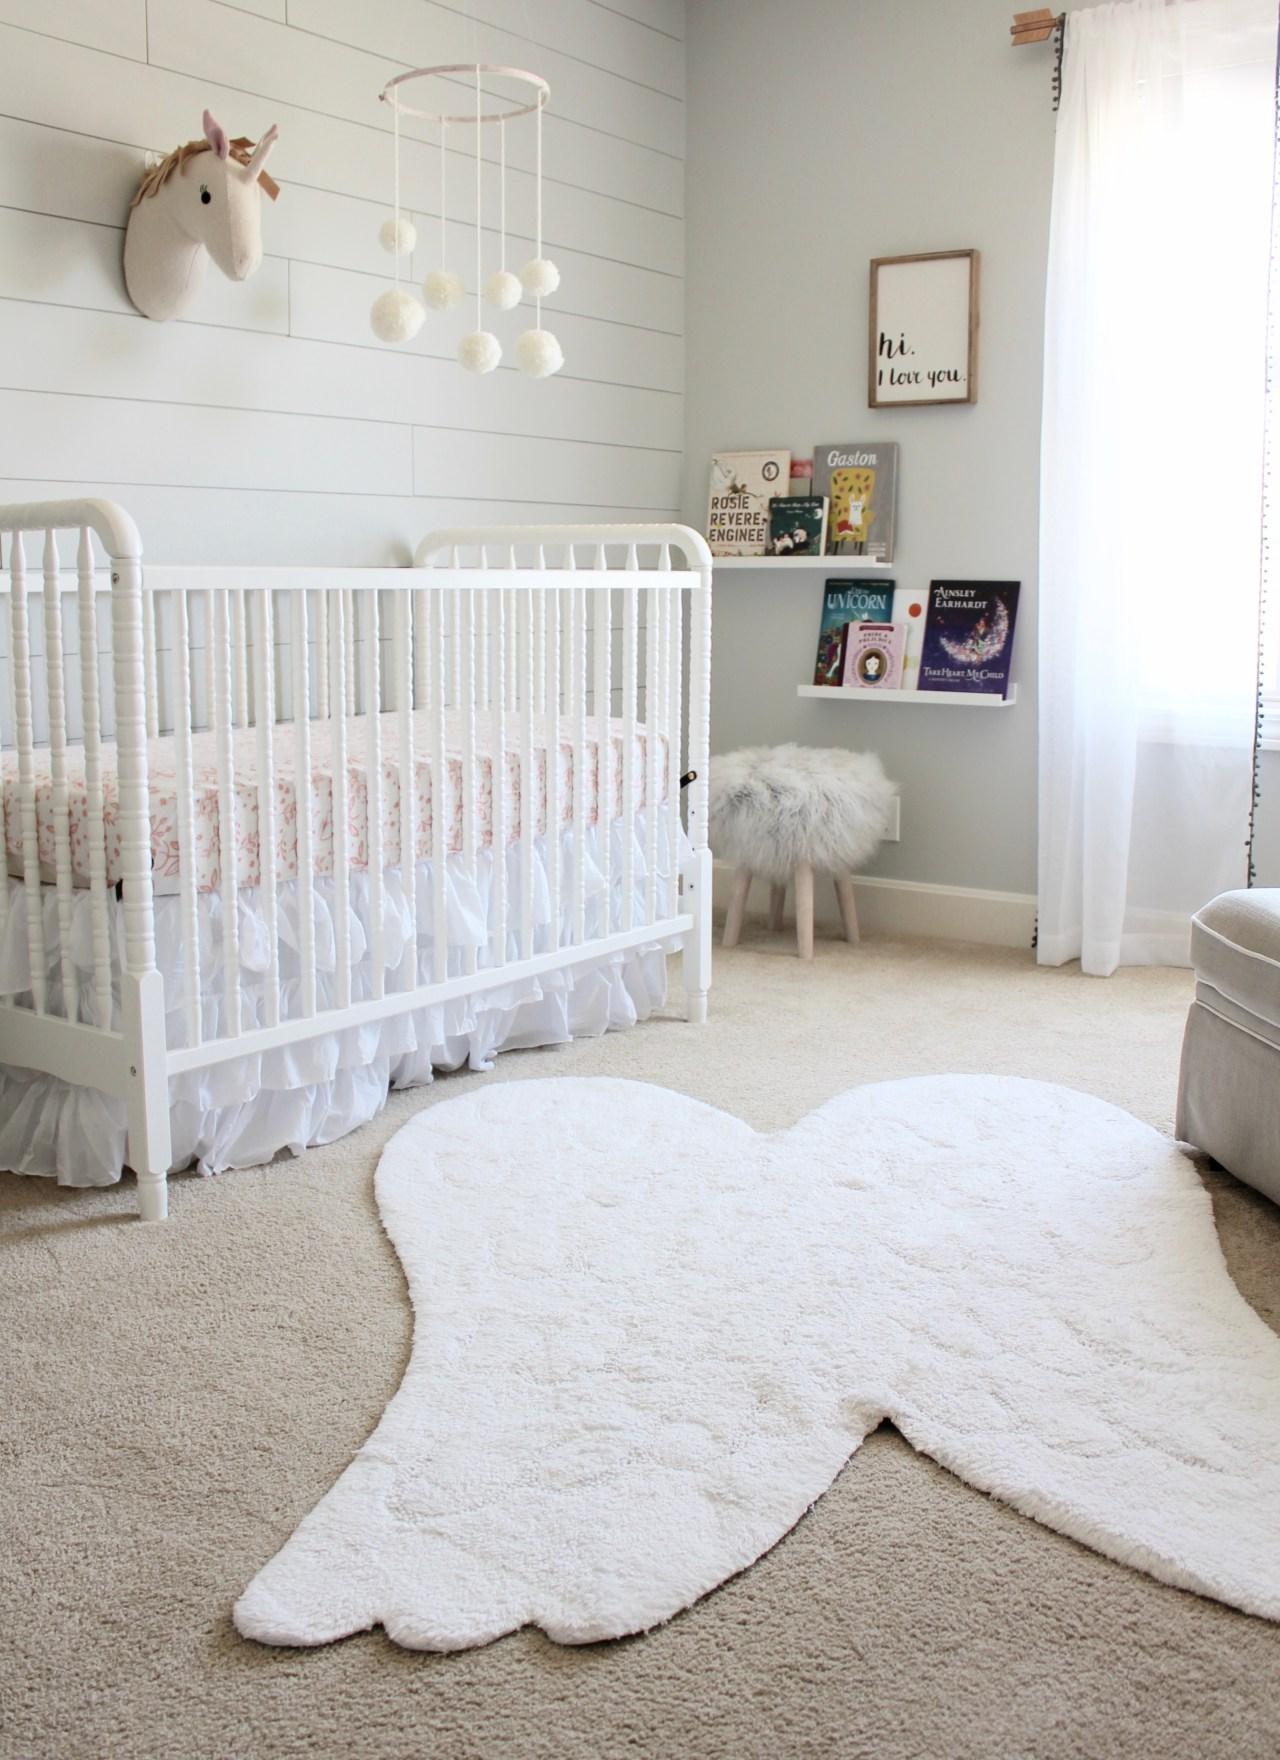 Hartley's Nursery